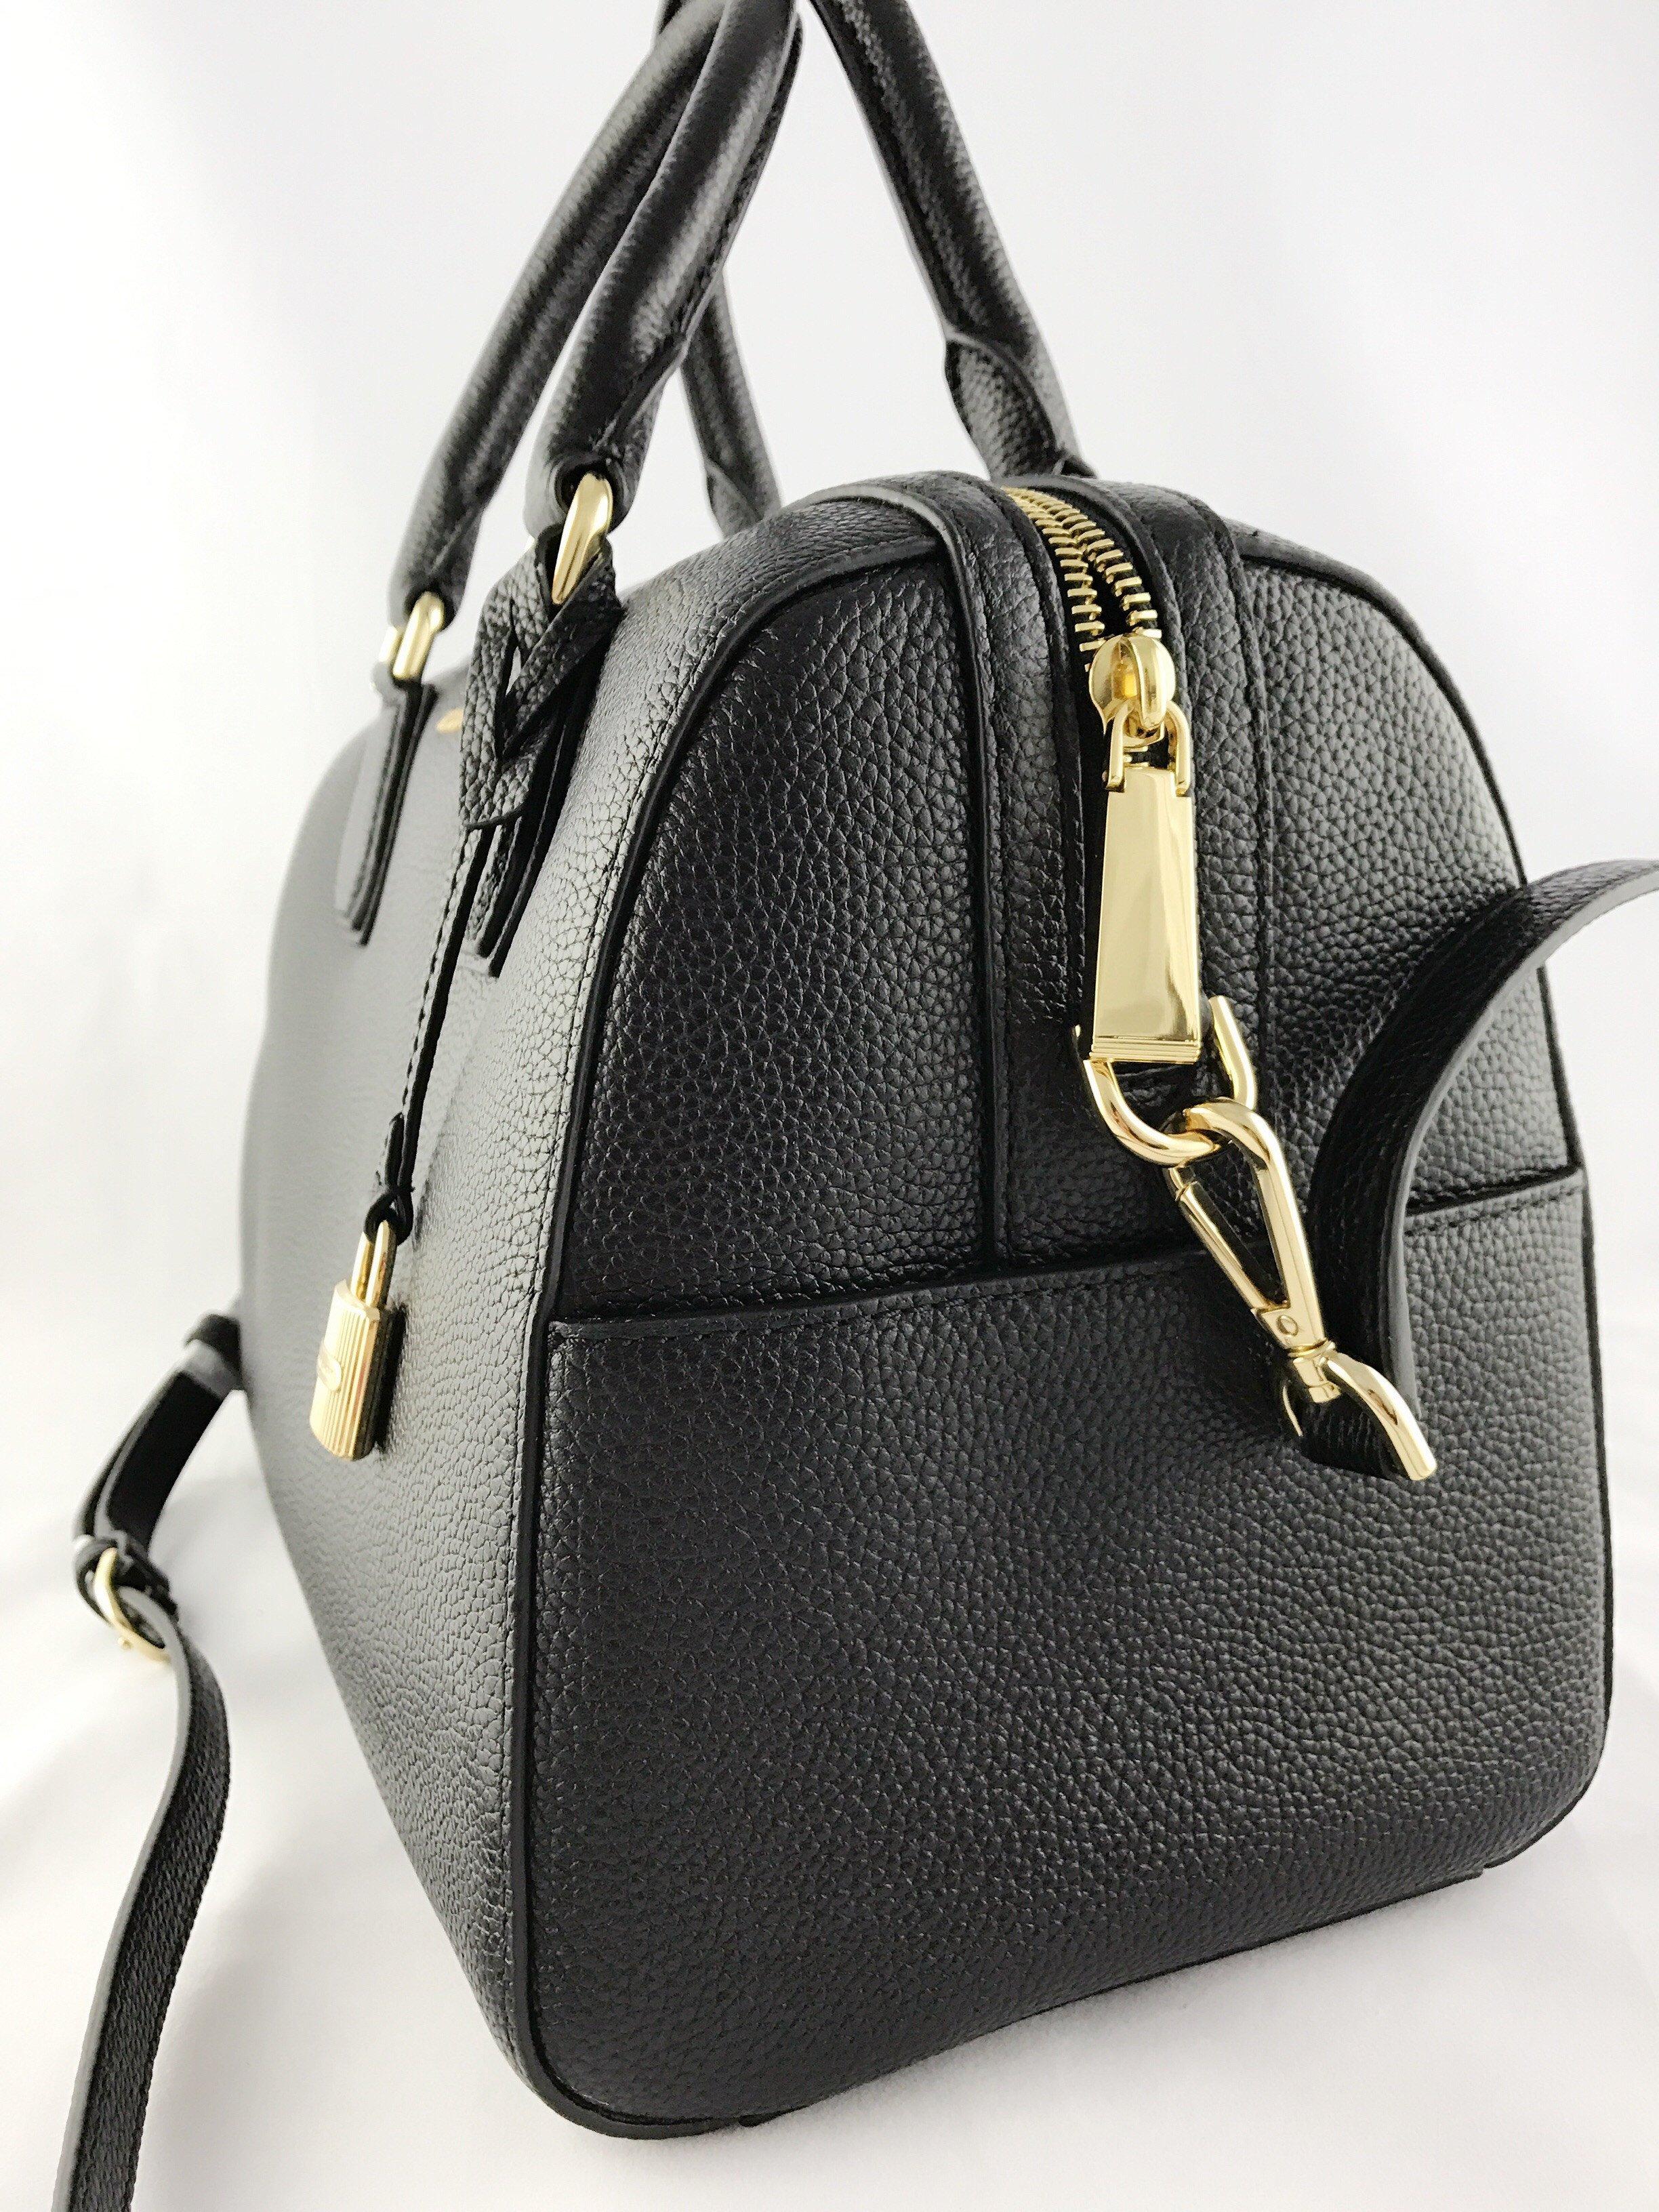 michael kors mercer medium duffle satchel bag black. Black Bedroom Furniture Sets. Home Design Ideas